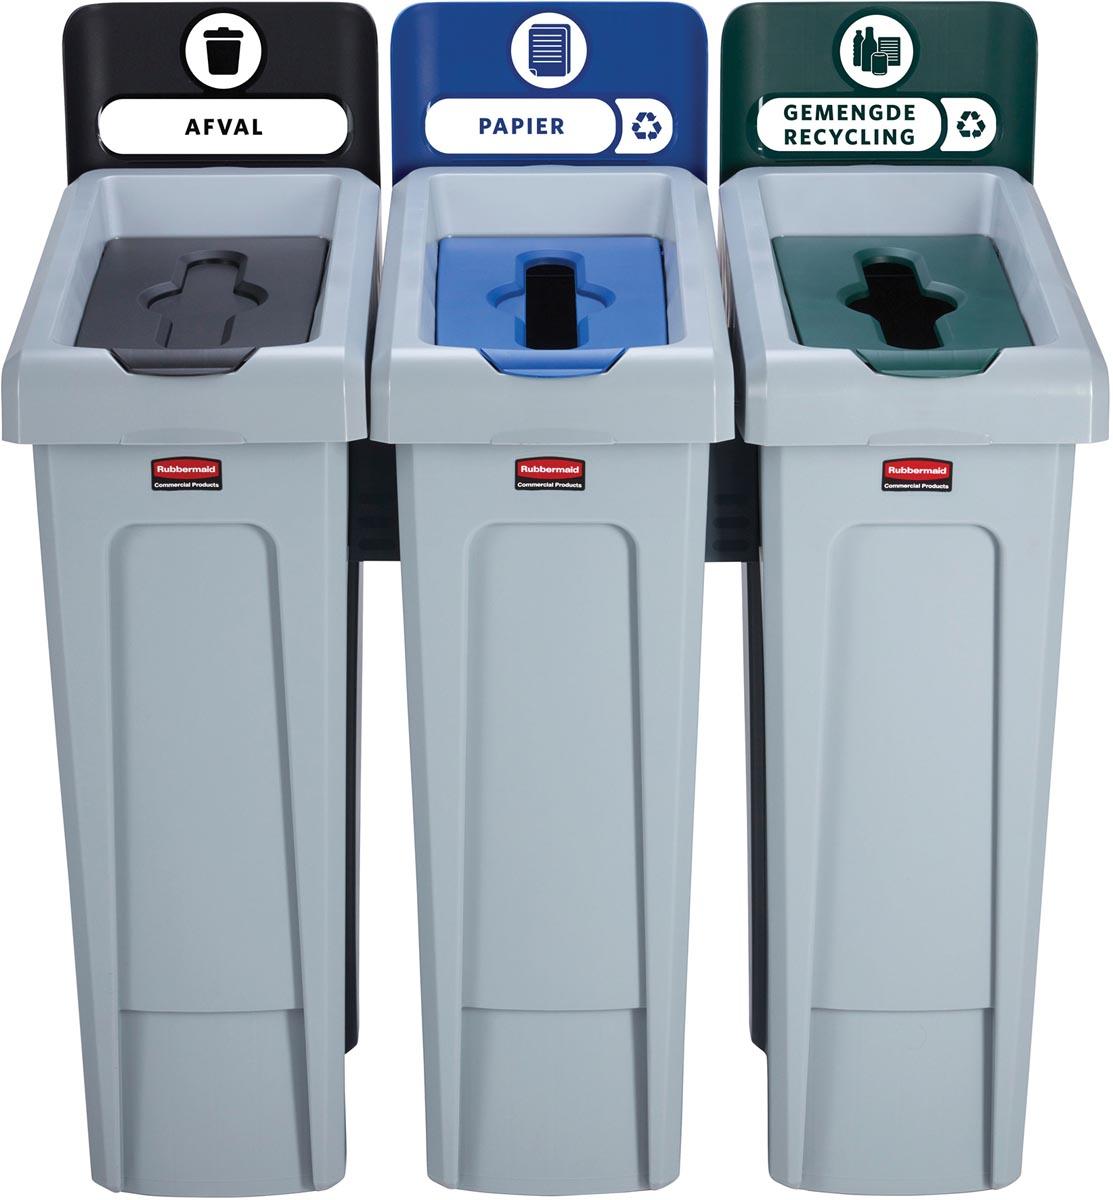 Rubbermaid Slim Jim Recyclingstation voor afval, papier en gemengde recycling, zwart / blauw / groen